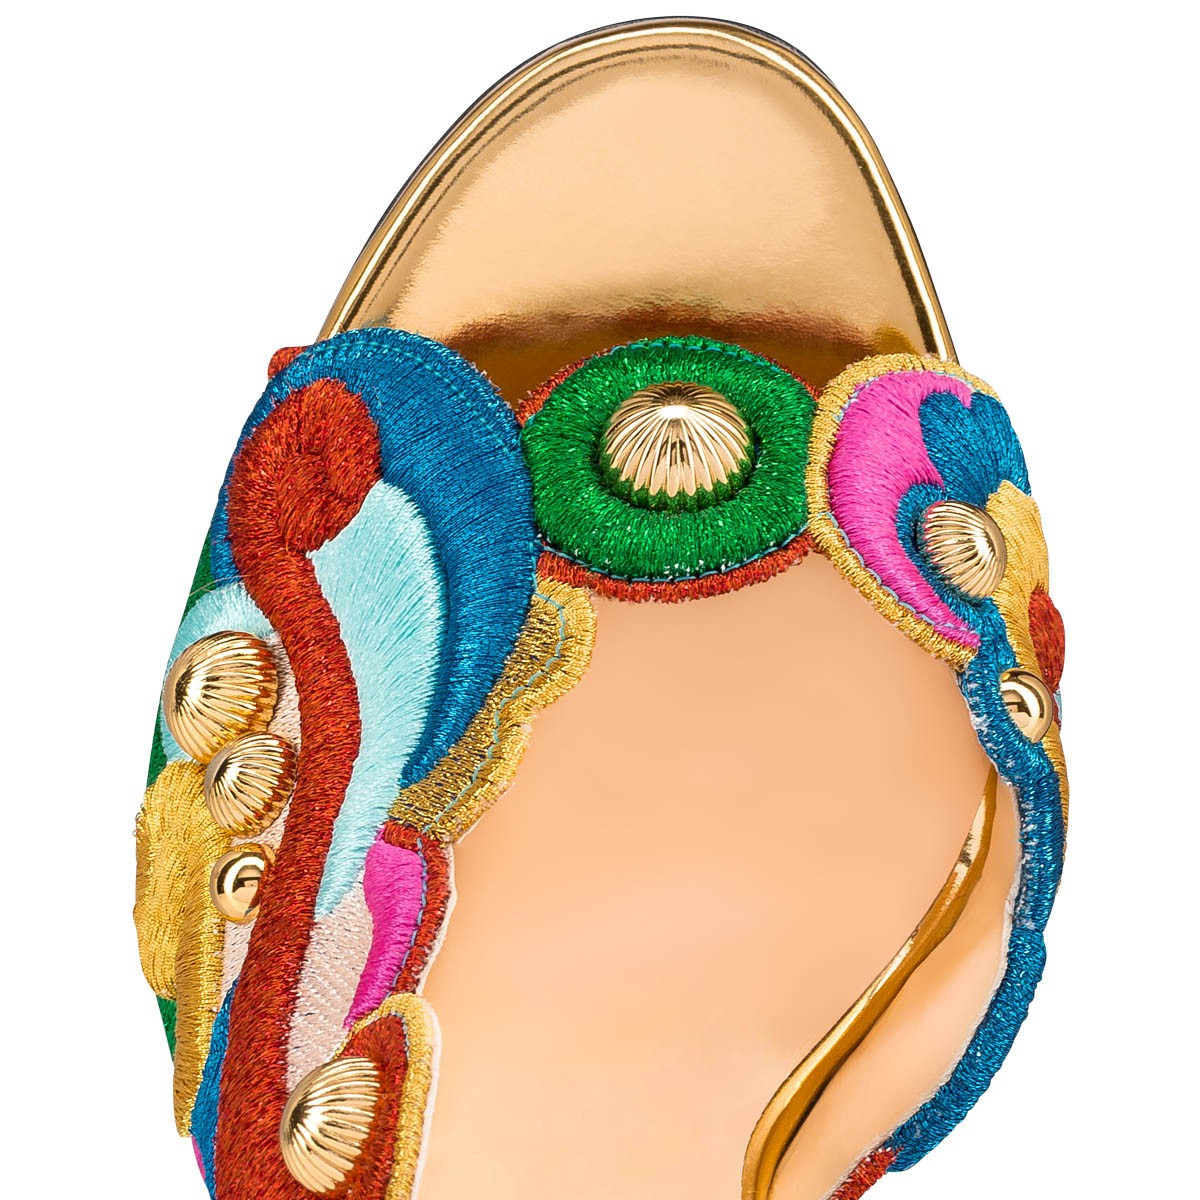 Women Shoes - Thimpumule - Christian Louboutin